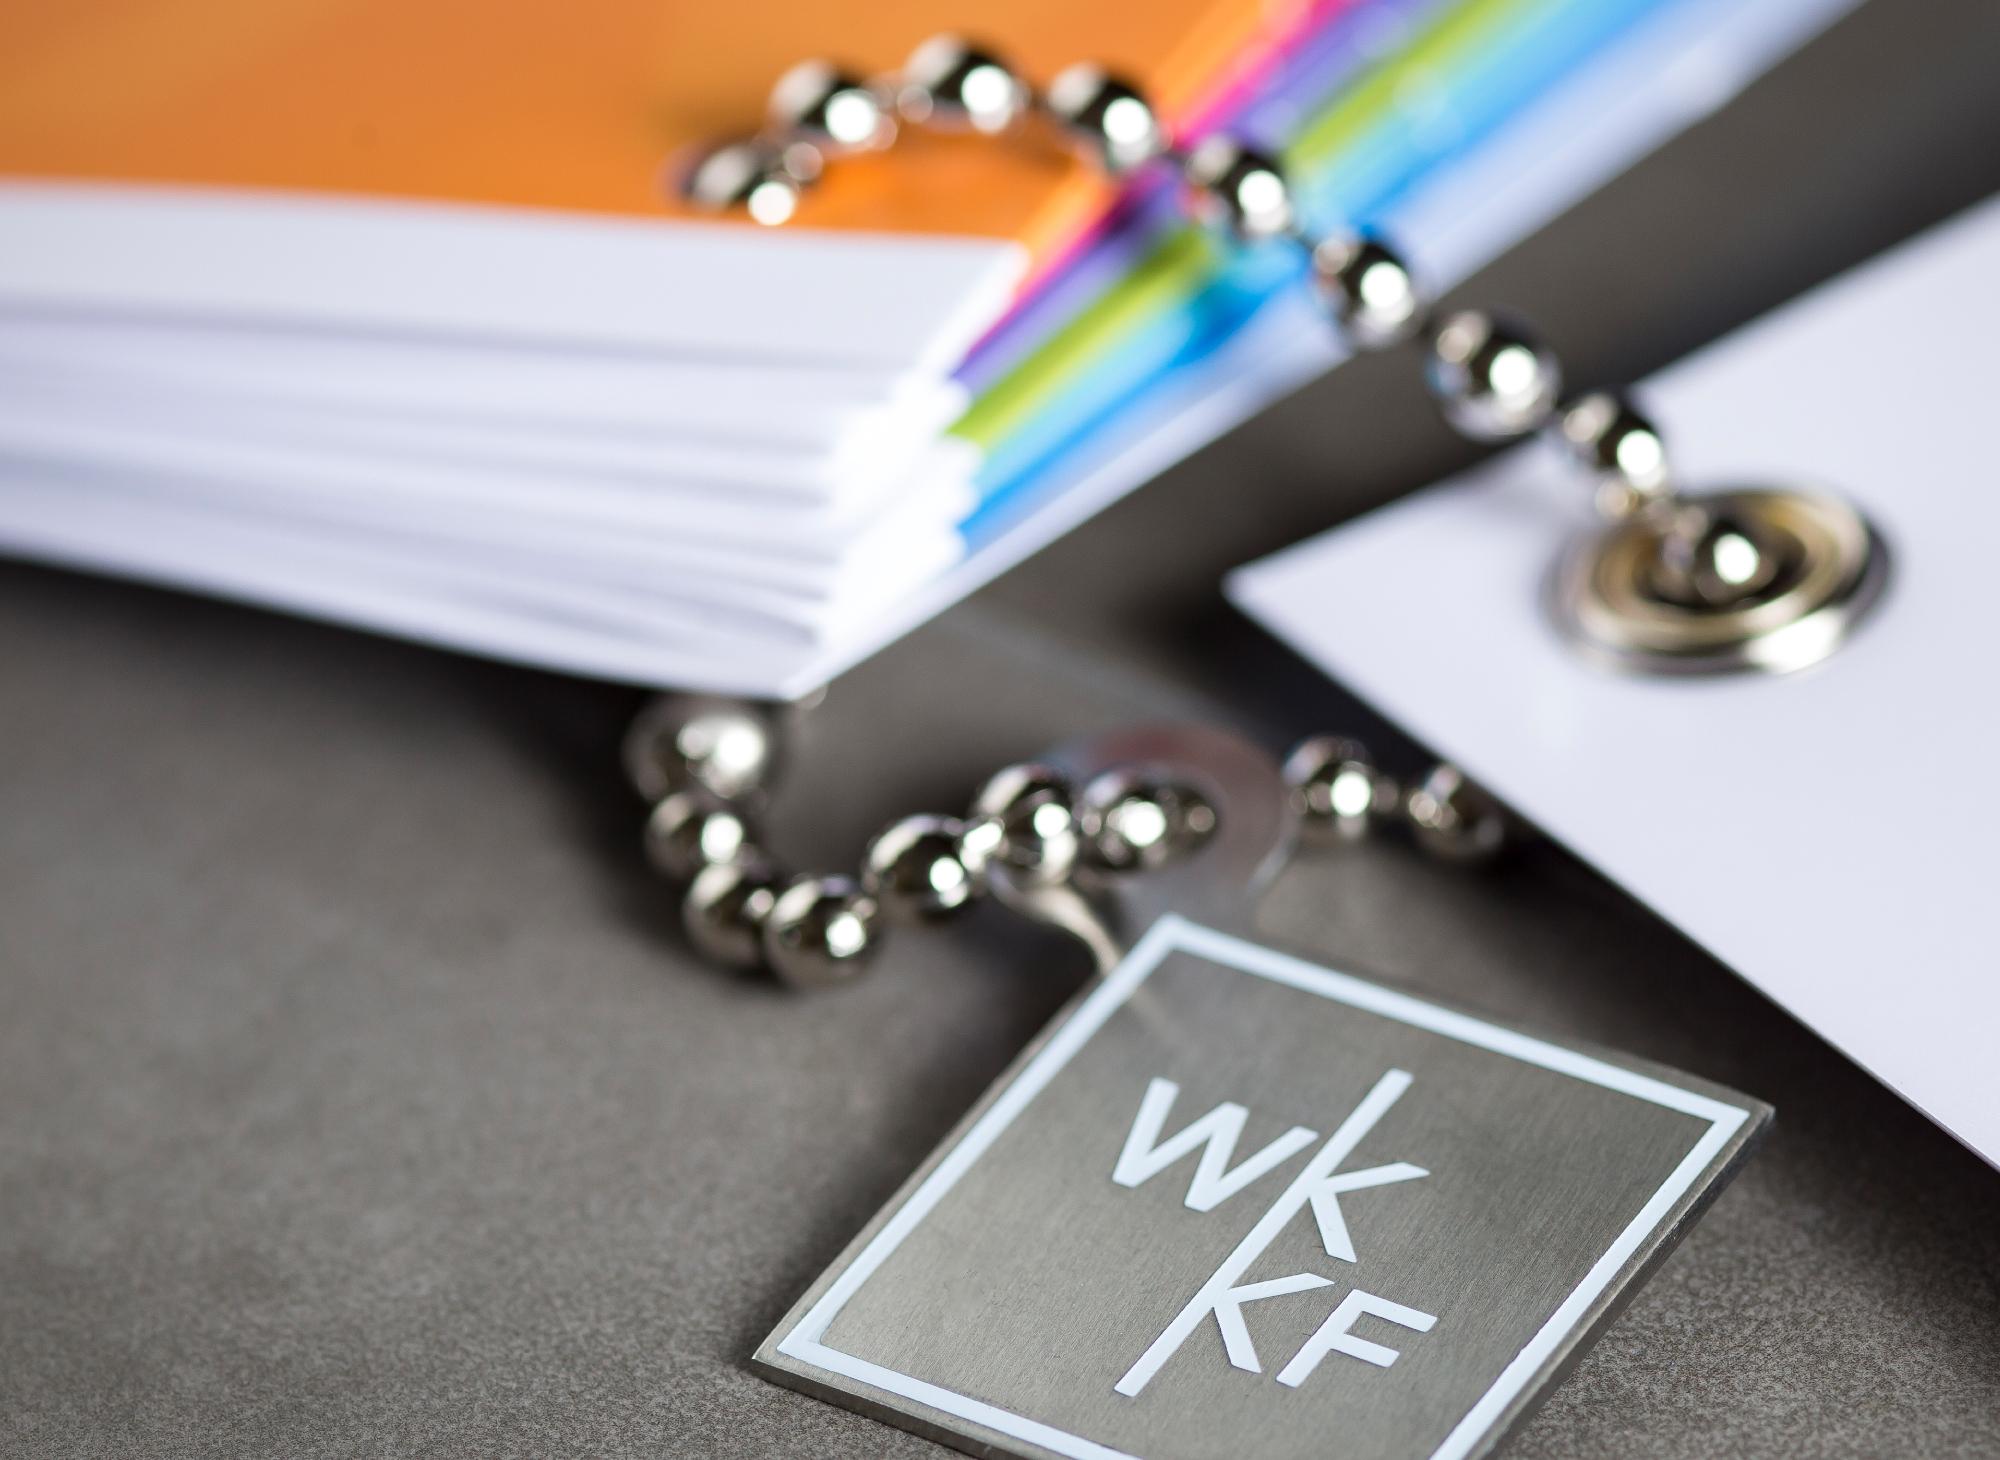 WK Kellogg Foundation Brand Refresh